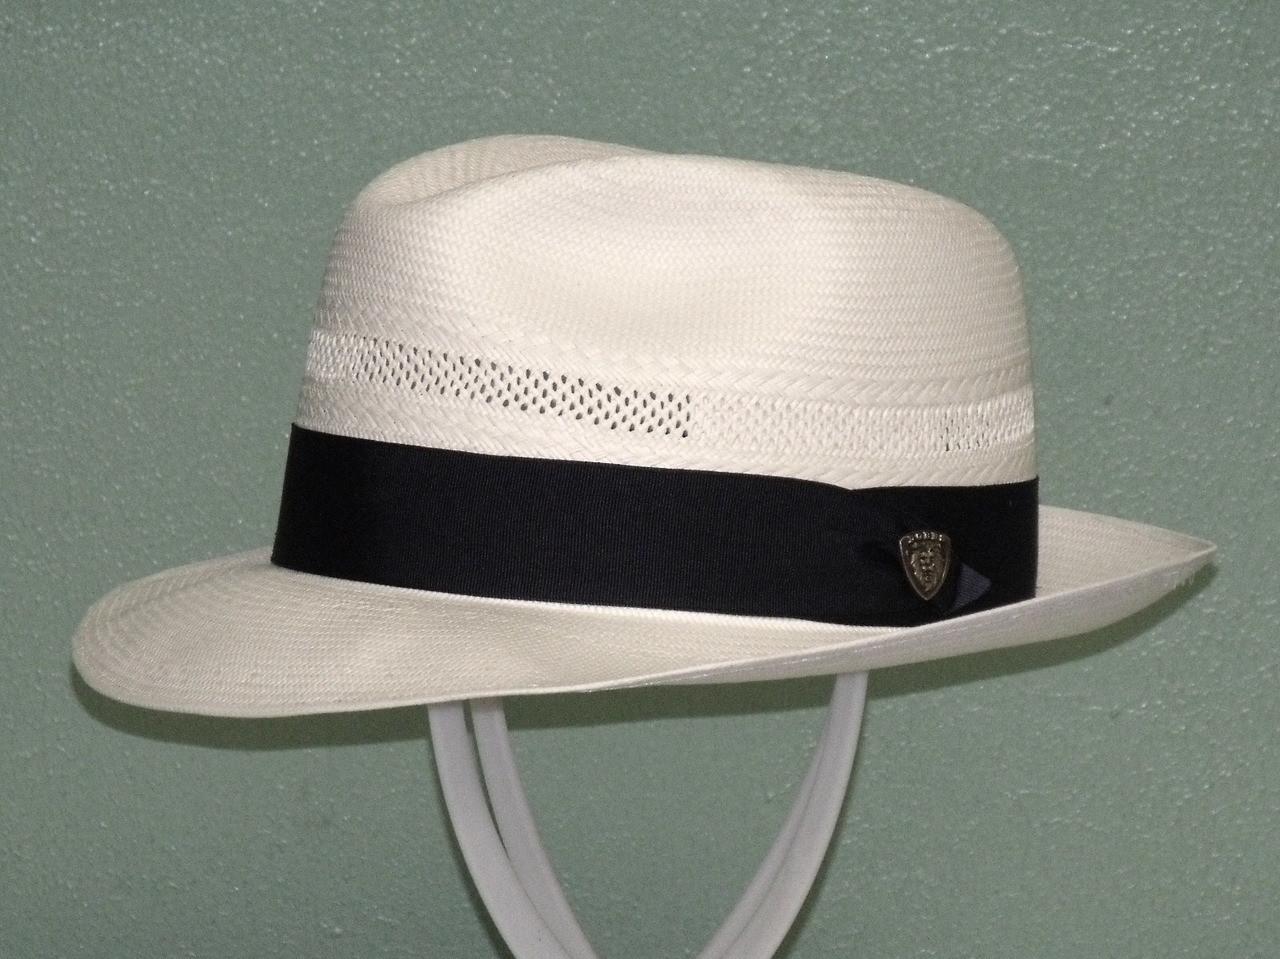 12ea2e683 Dobbs Vented Center Dent Shantung Fedora Hat - One 2 mini Ranch